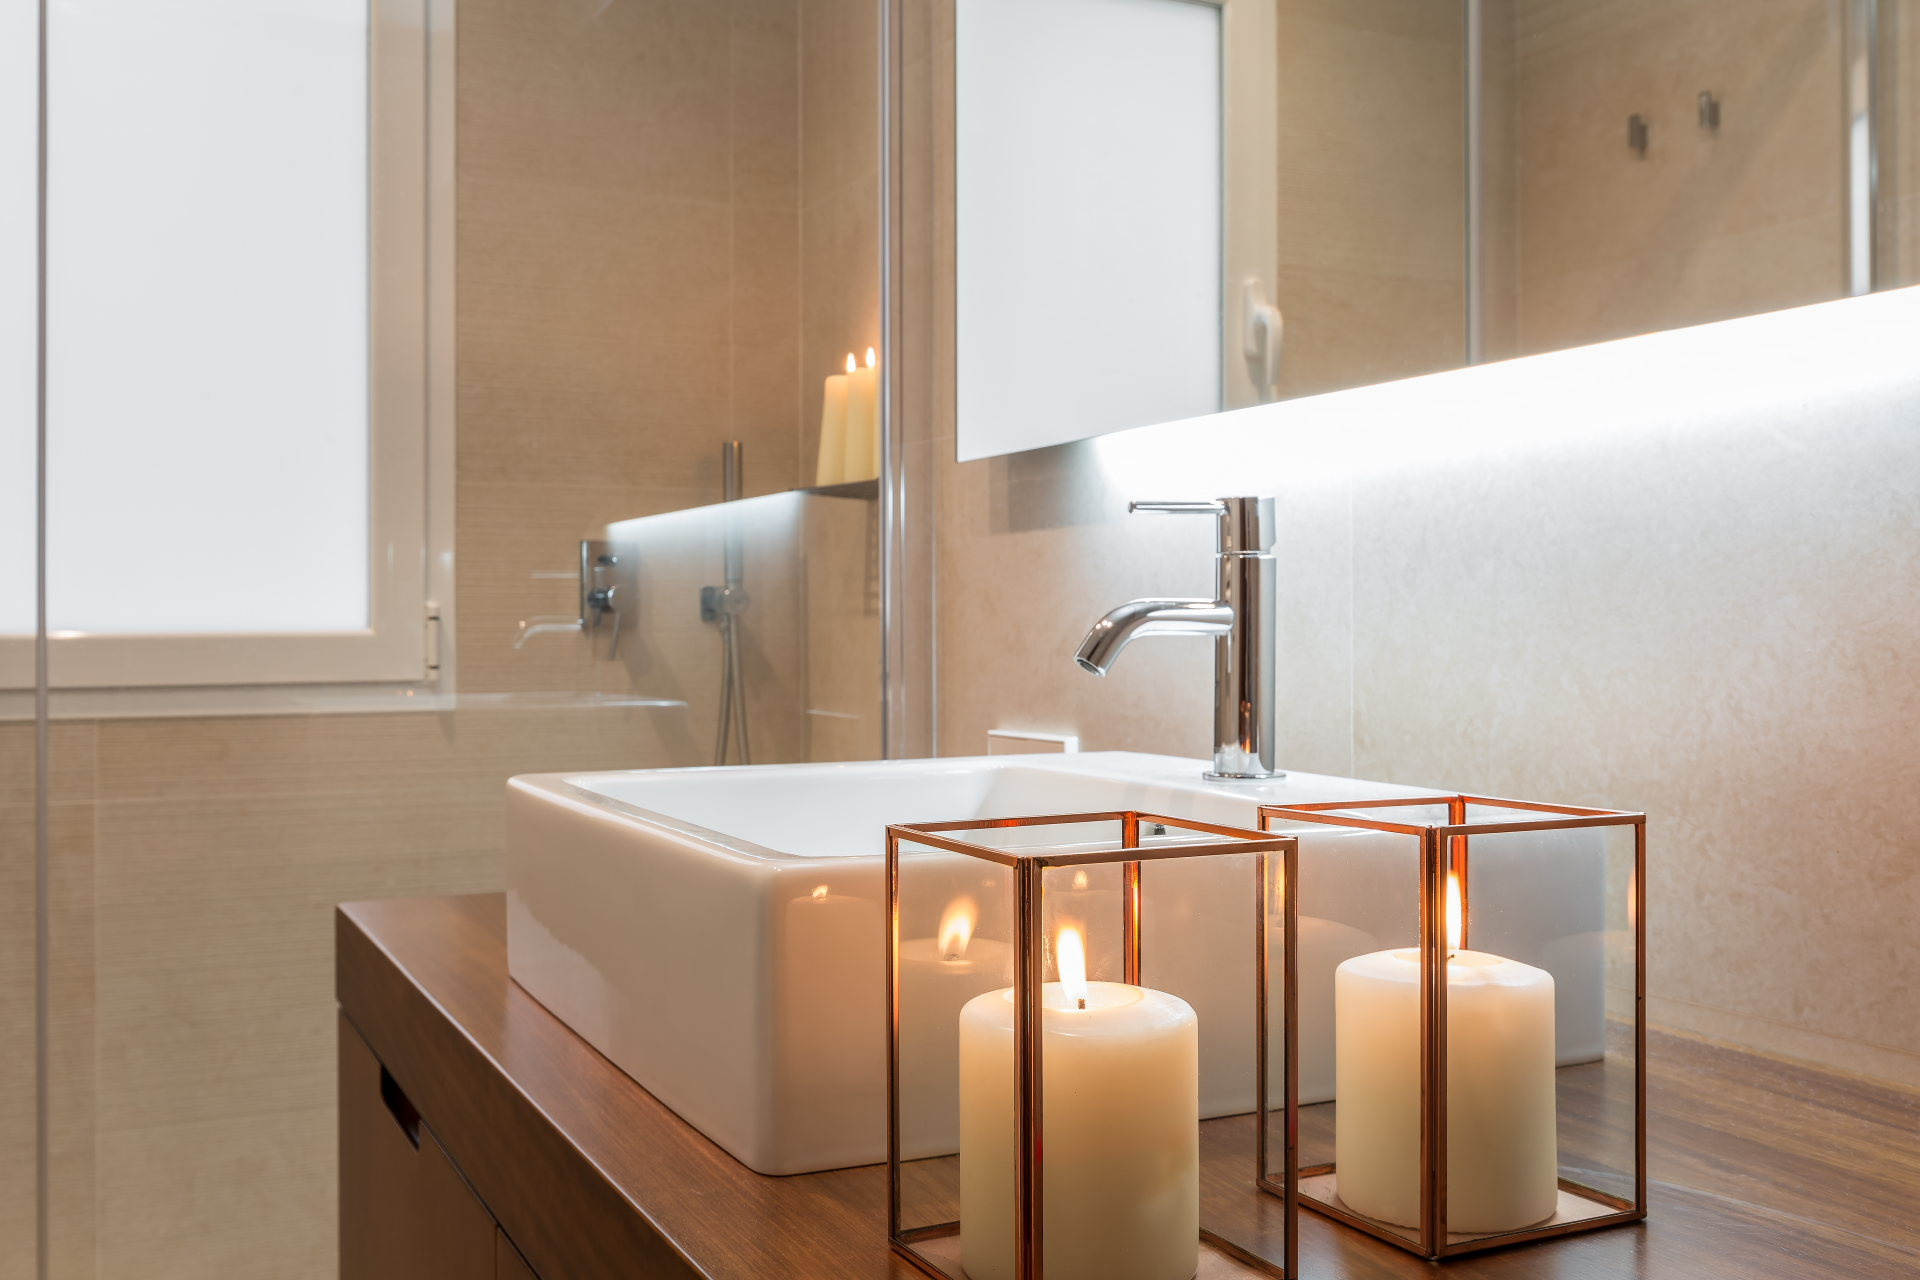 fotografia-arquitectura-interiorismo-valencia-fenollar-german-cabo-laura-yerpes  (24)